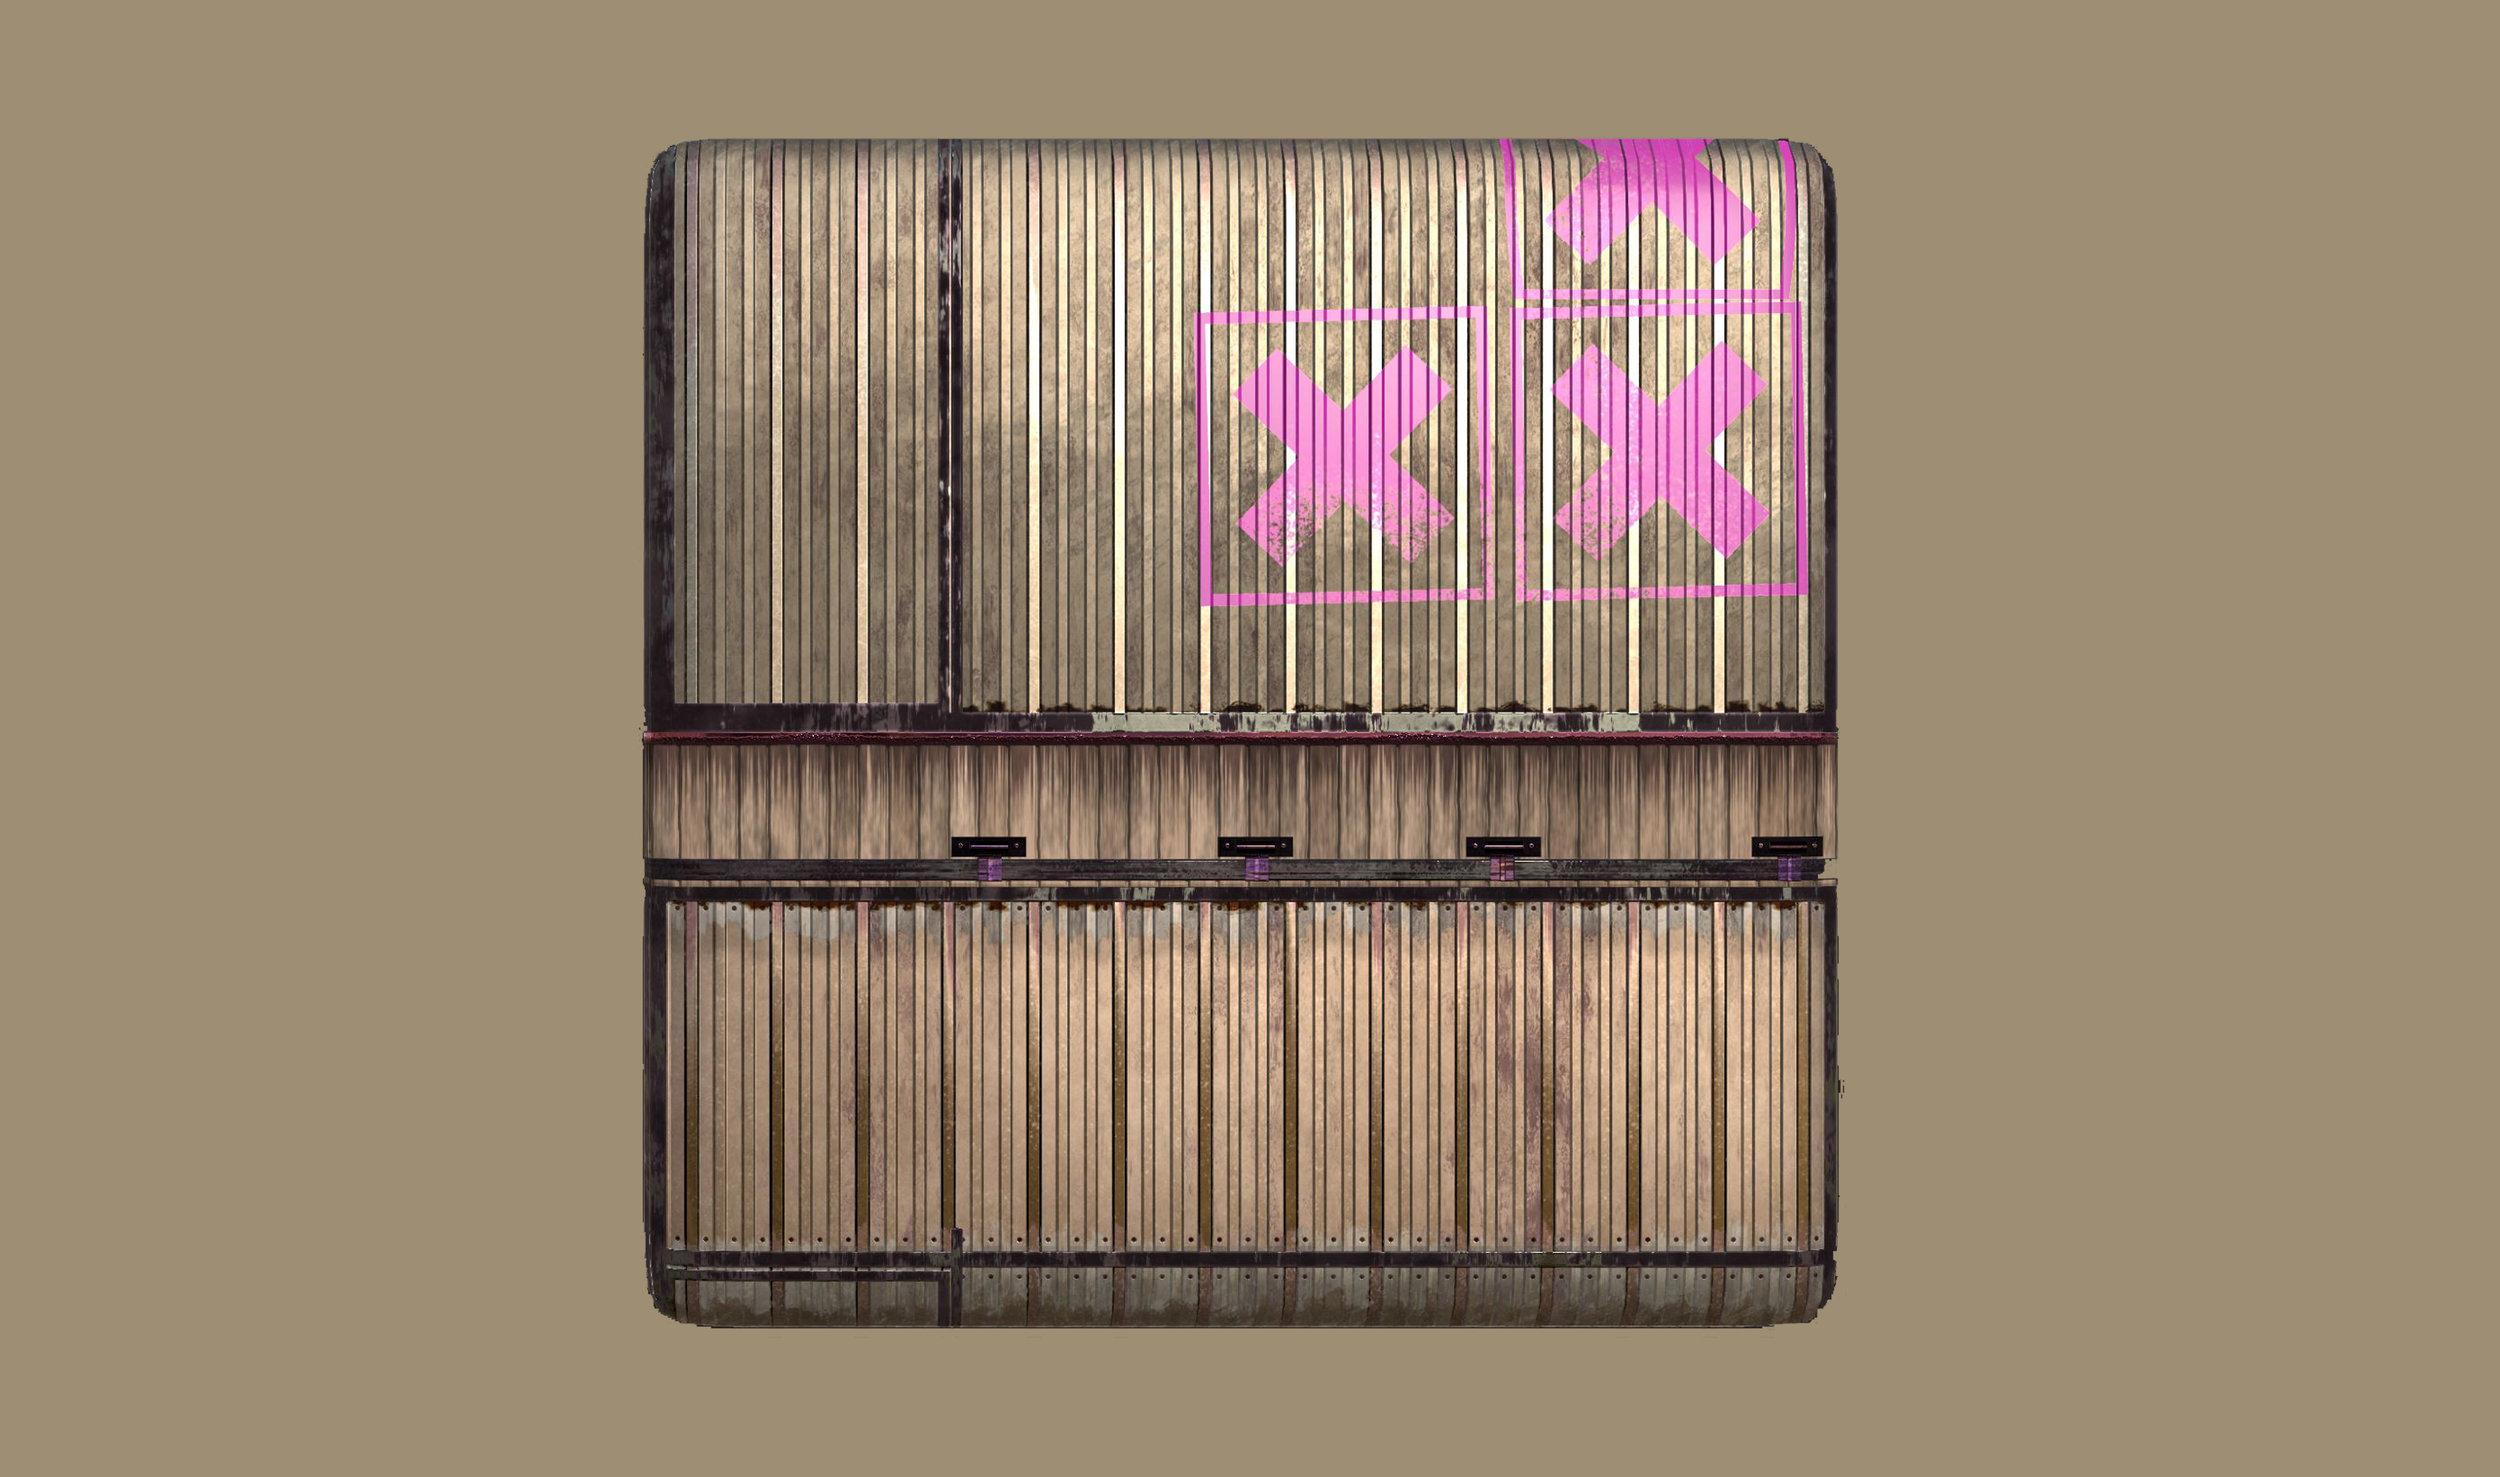 FictionMine_VR_MaterialAutoring007_2.jpg